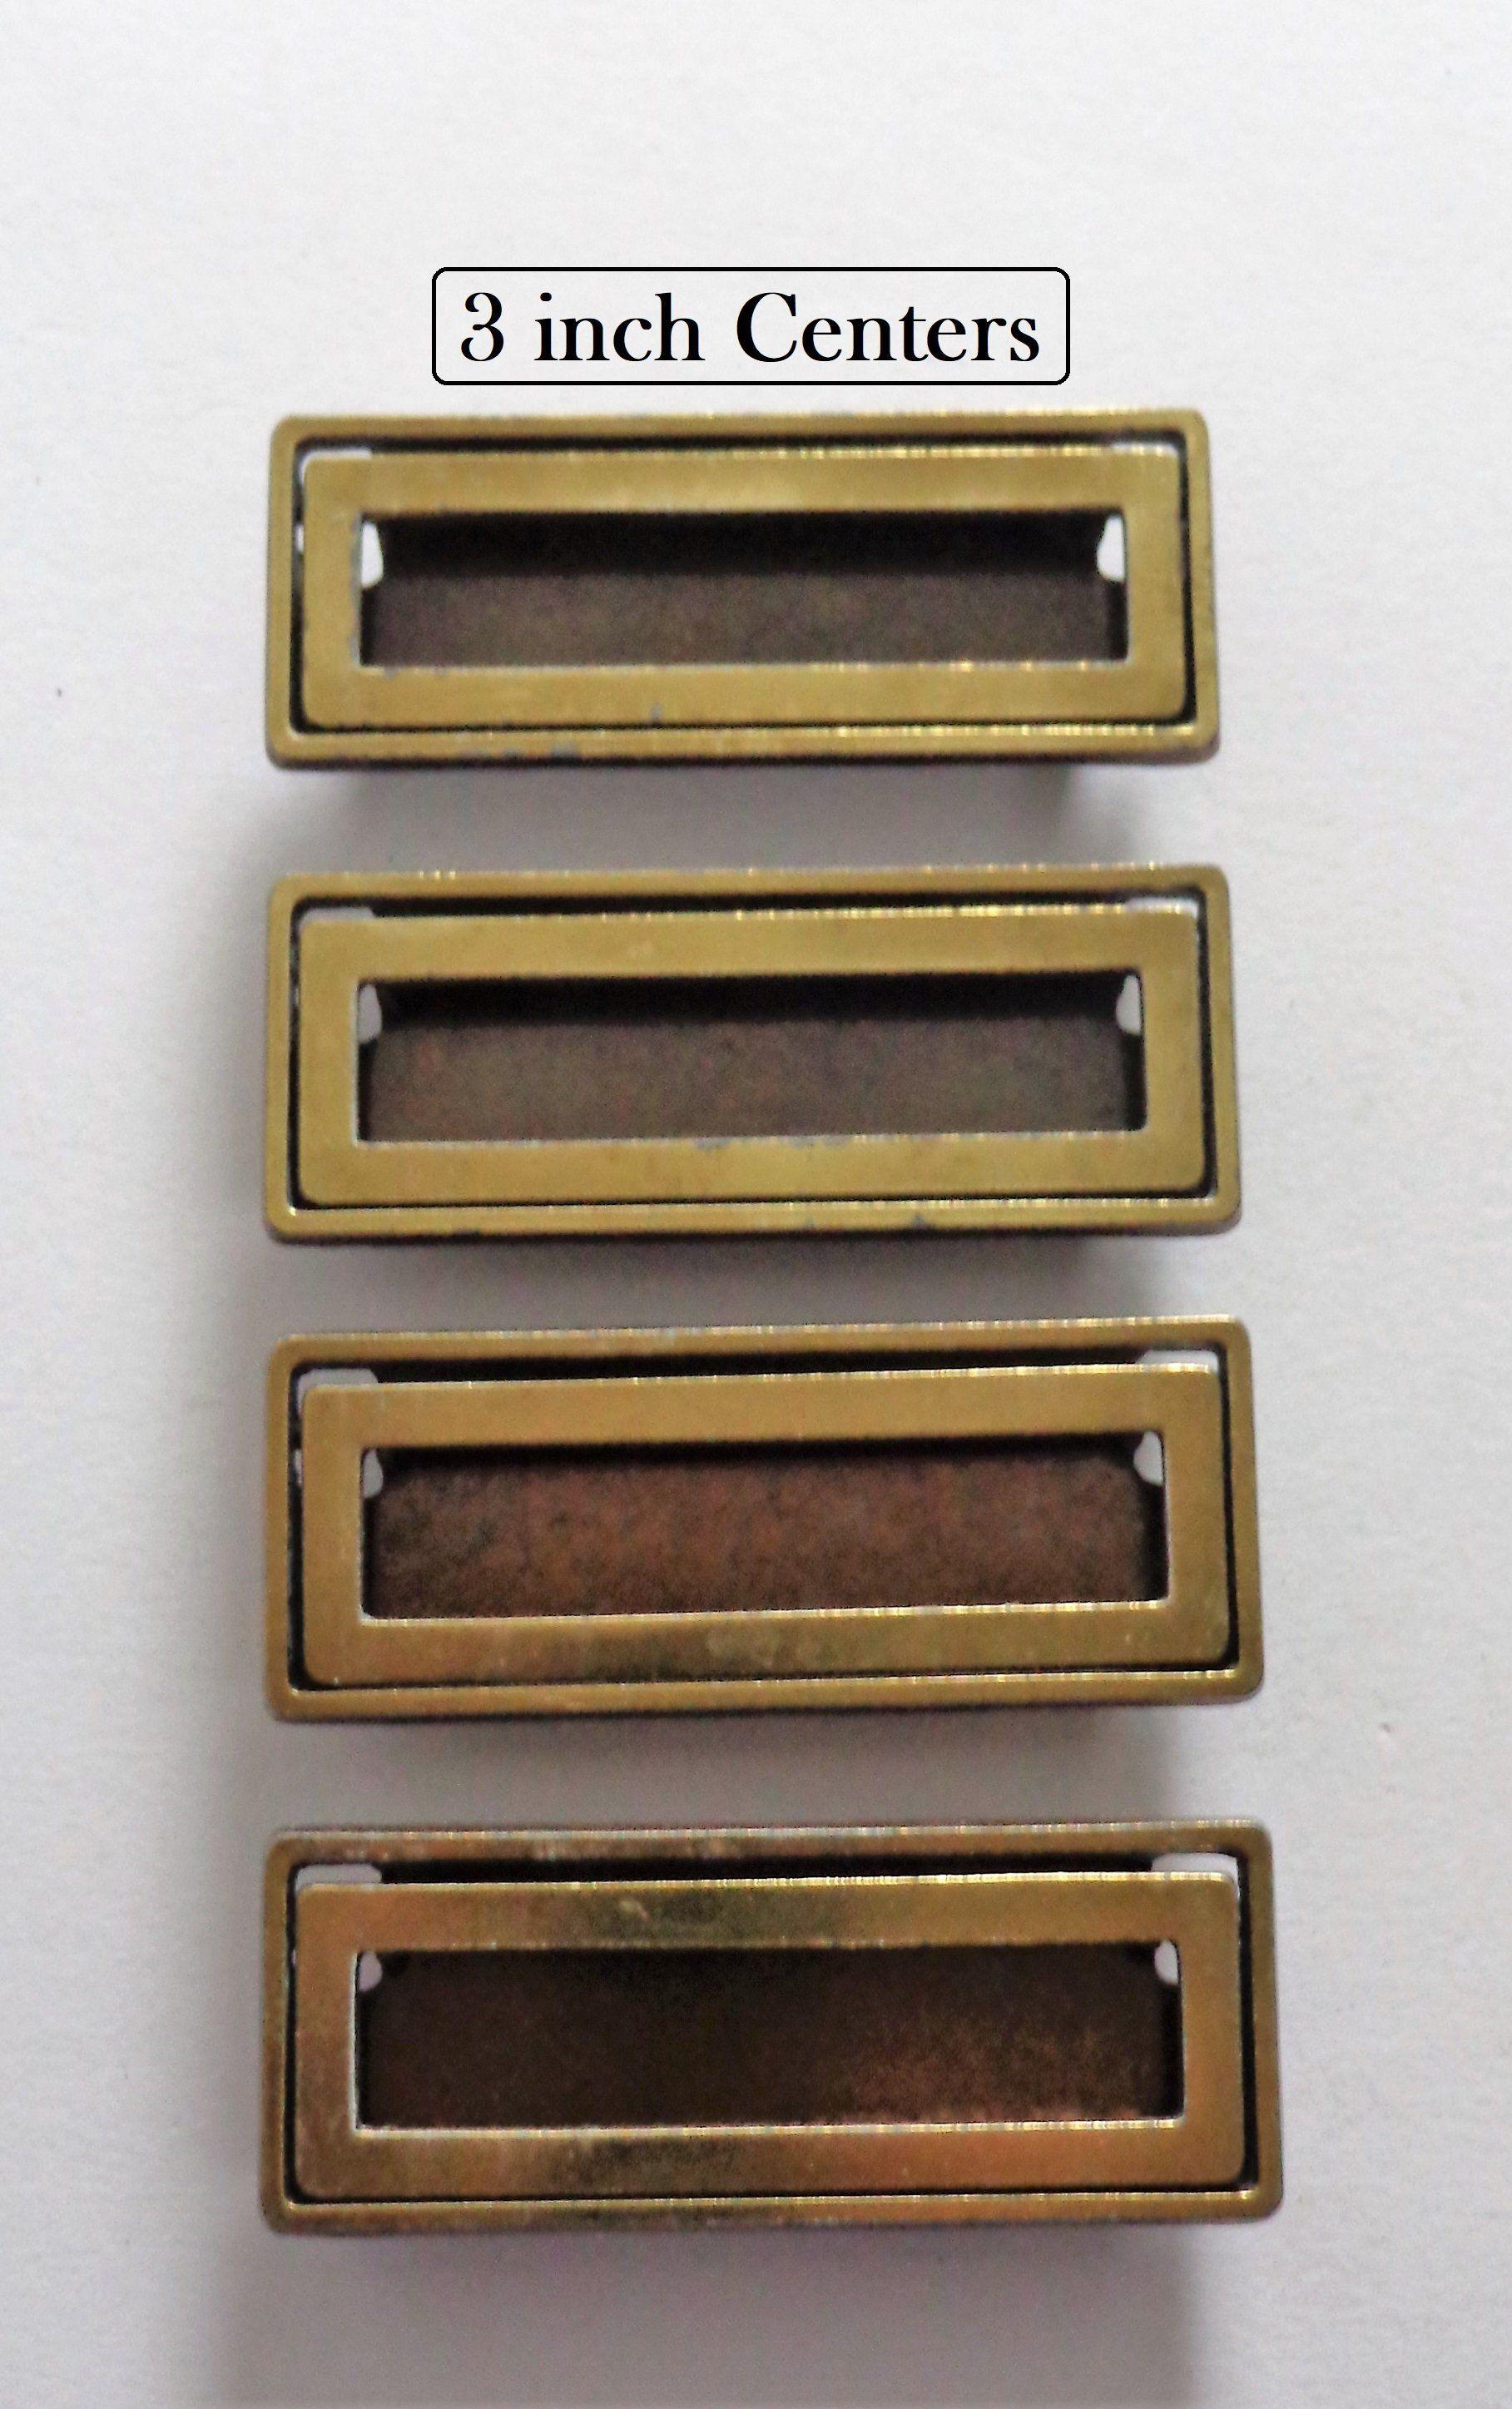 Antique Drawer Pull Keeler Brass Round A202 Hepplewhite Etsy Antique Drawer Pulls Antique Drawers Drawer Pulls